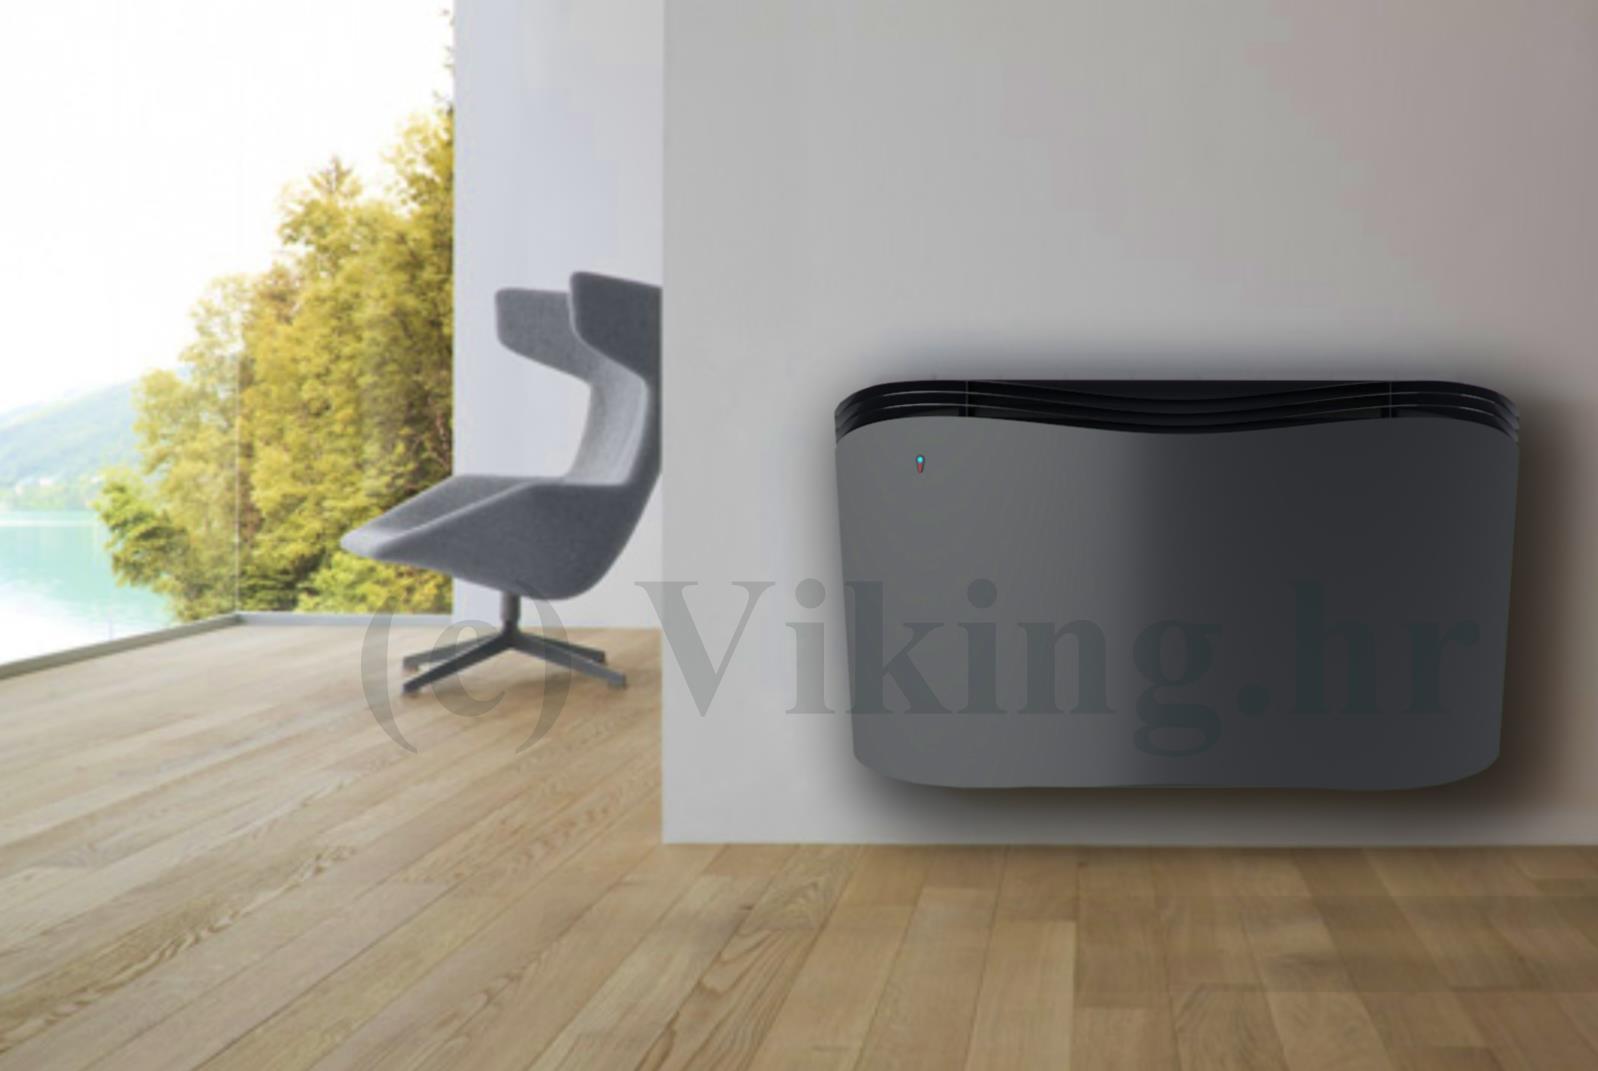 Avantage Viking radijator